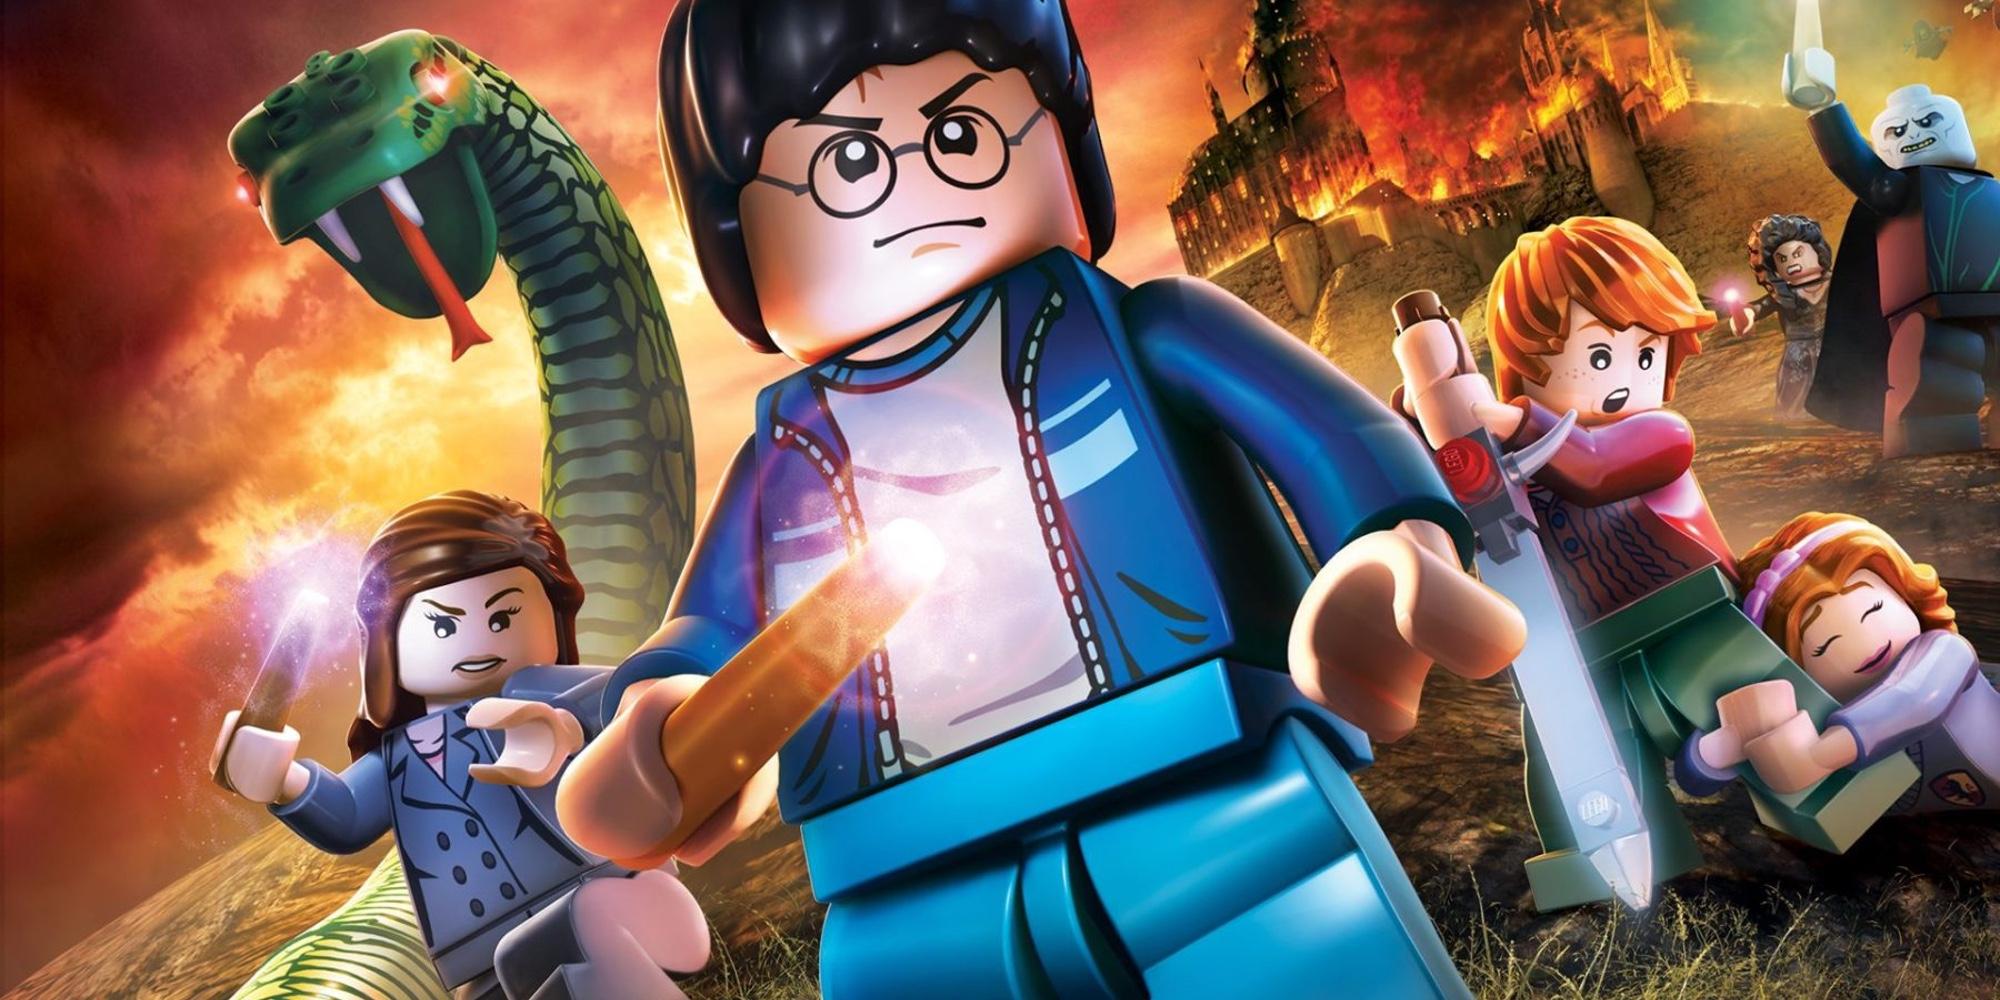 Today's Best iOS & Mac App Deals: LEGO Harry Potter, Splitter Critters, more